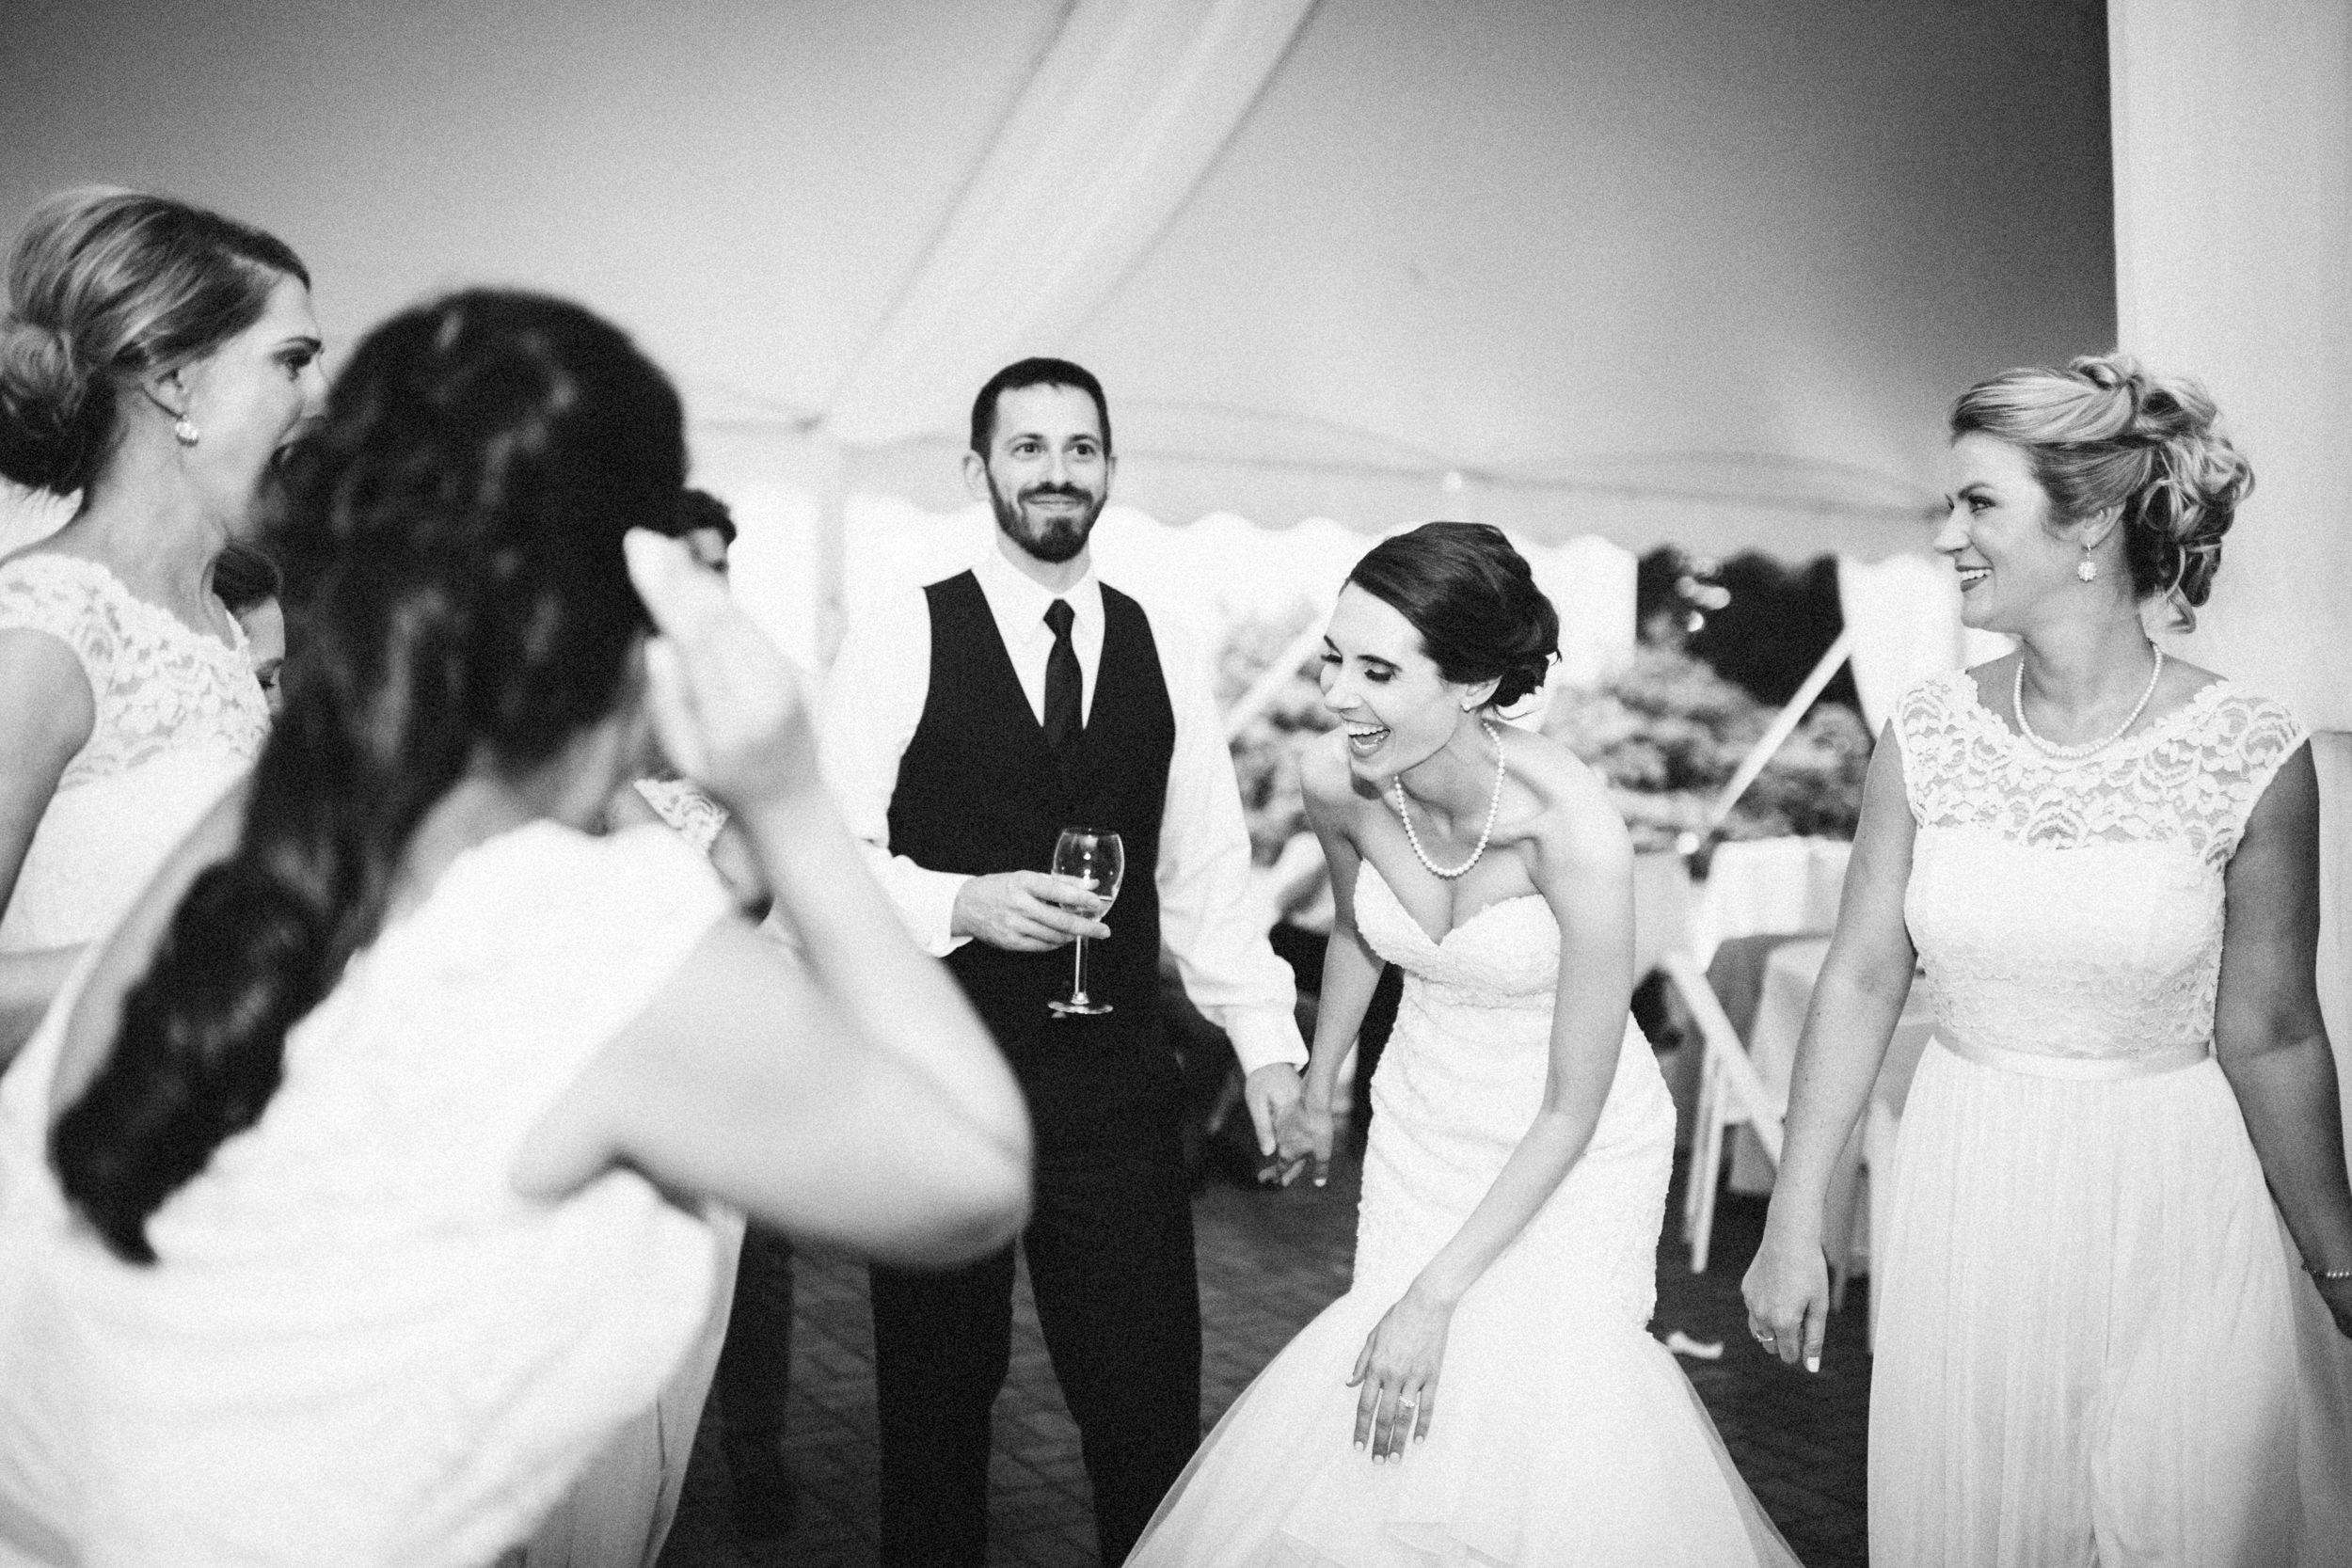 Louisville-Kentucky-Wedding-Elopement-Photographer-Sarah-Katherine-Davis-Photography-Whitehall-Classic-Timeless-Garden-Wedding-803.jpg